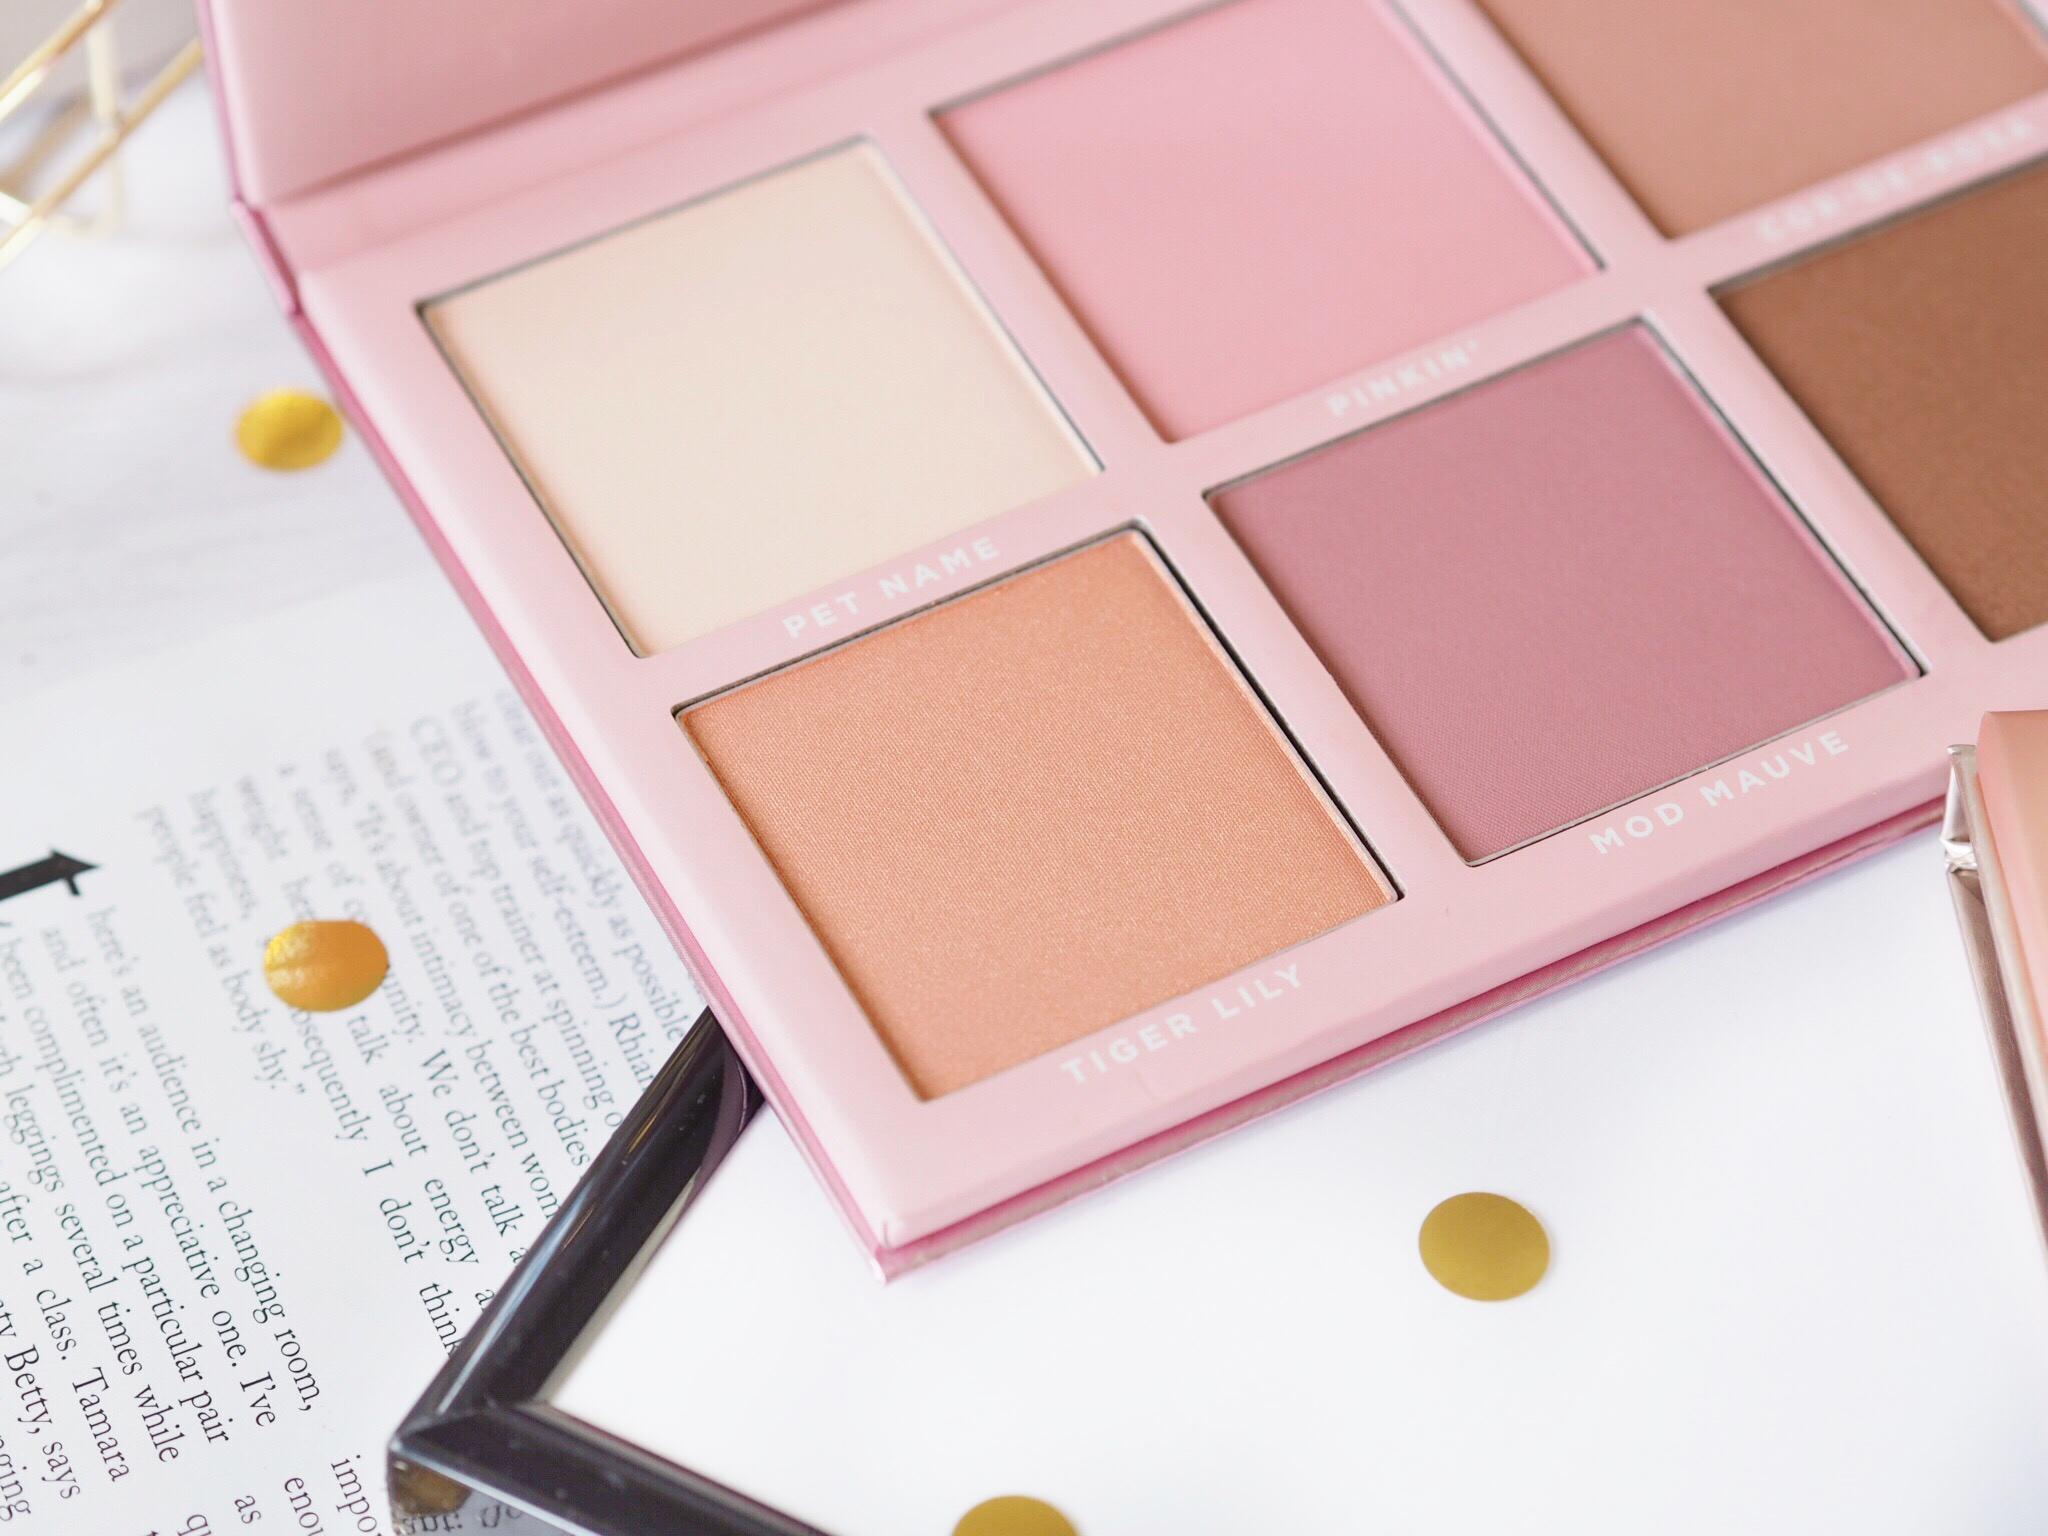 Sigma Blush Palette Review